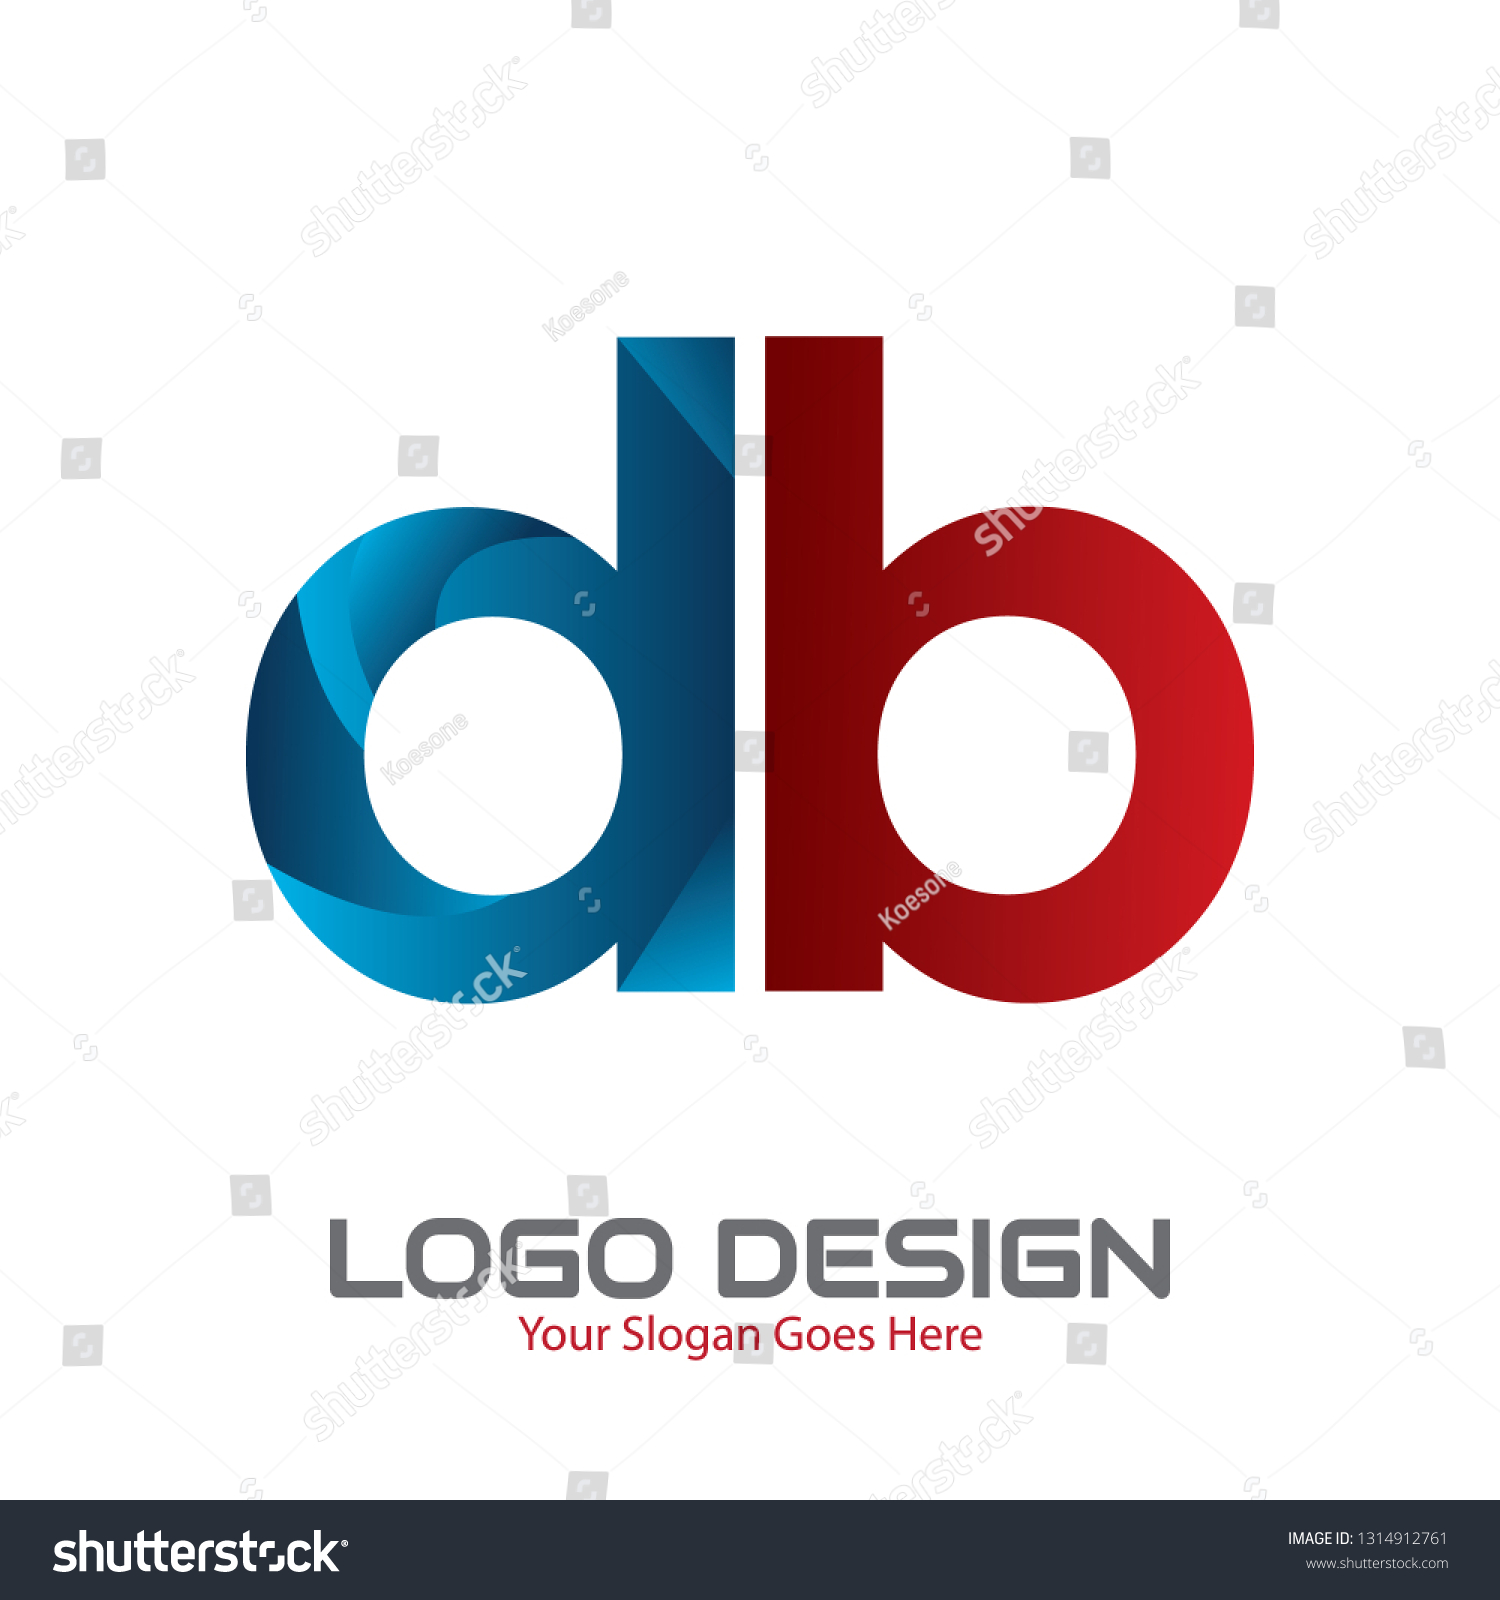 Vector Logo Design Full Color Eps10 Stock Vector Royalty Free 1314912761,Minimalist Kitchen Design Black